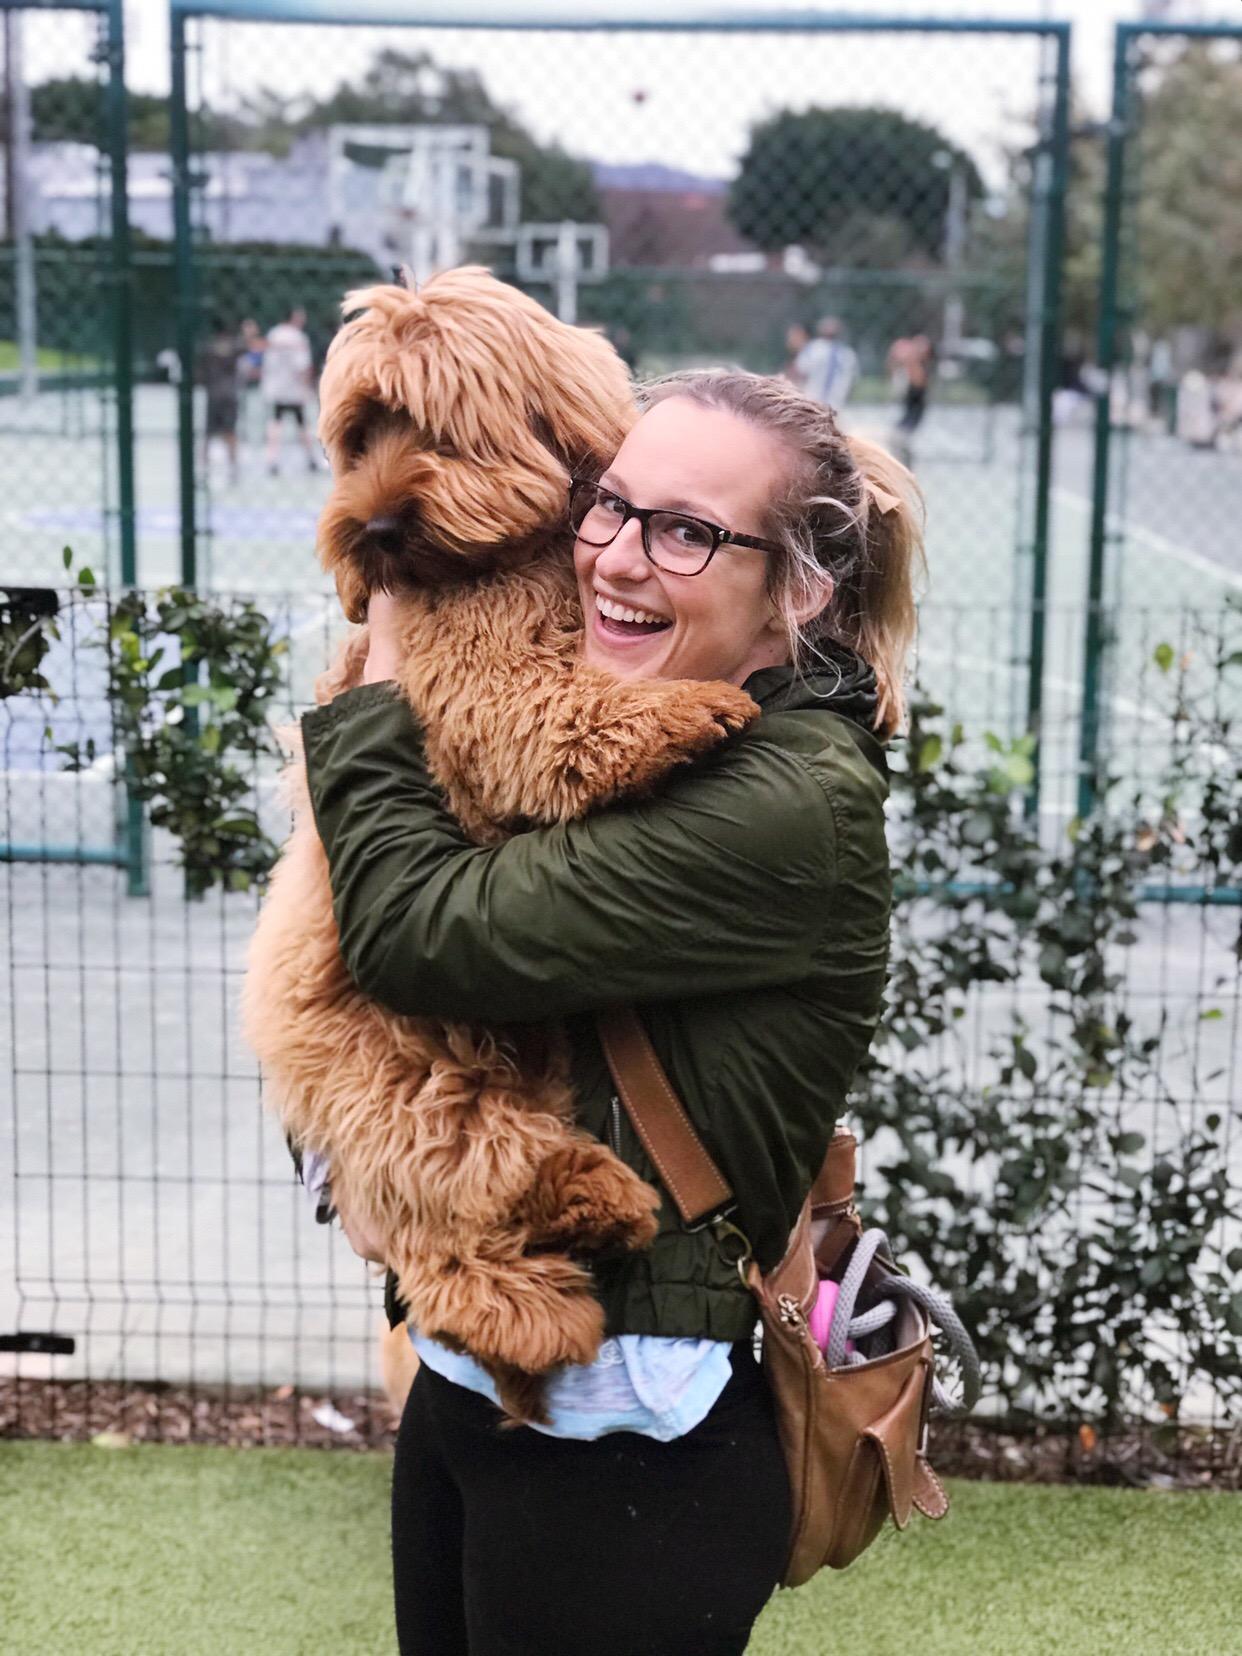 Best_Friend_Dog_Park.JPG